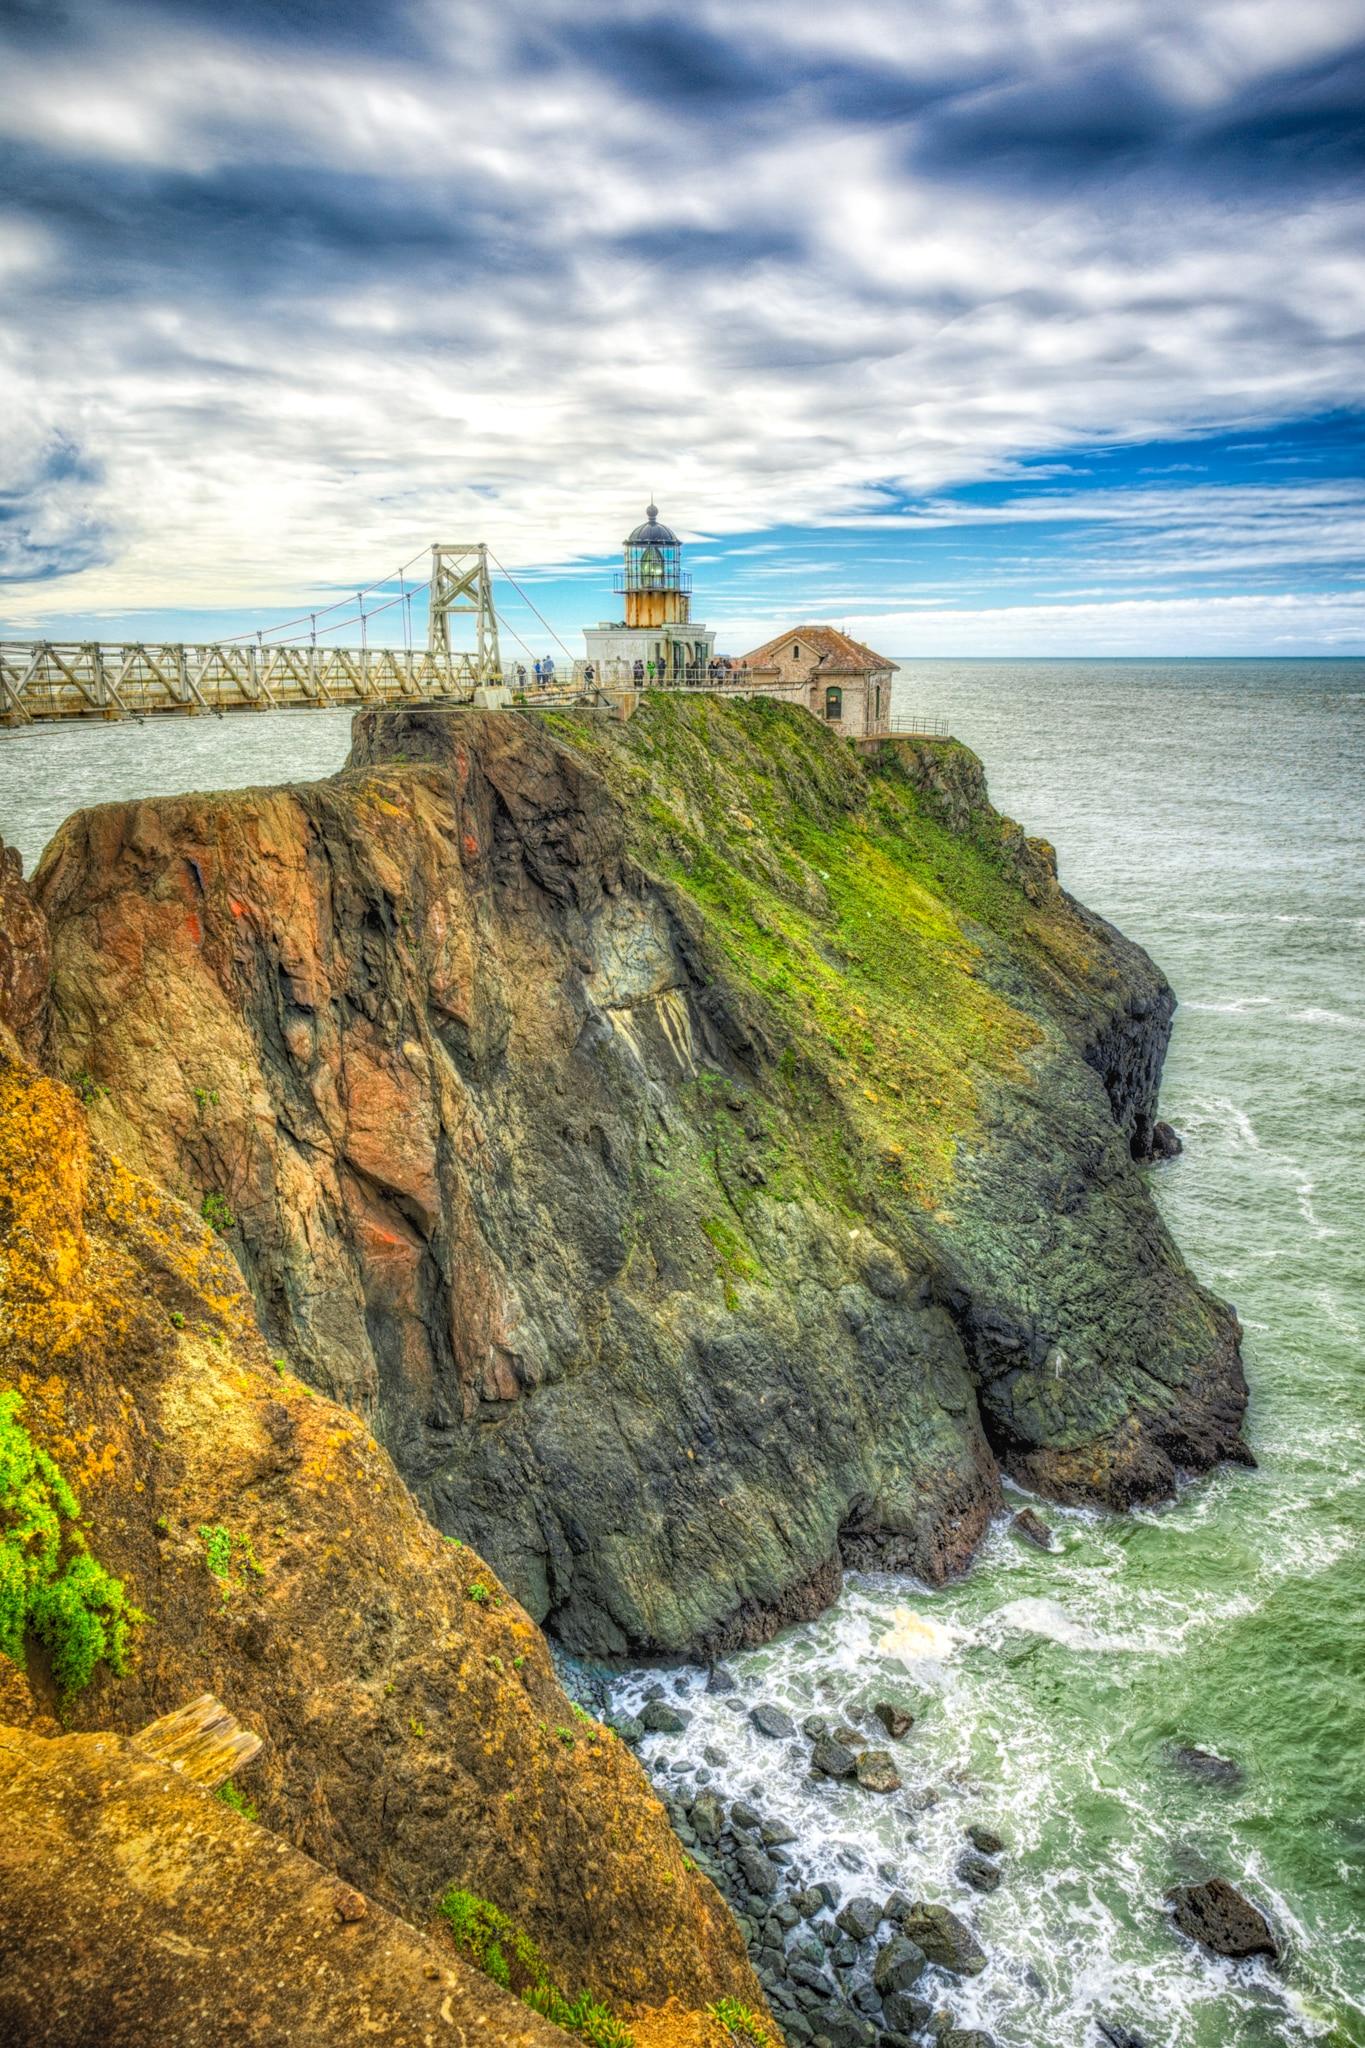 Point Bonita Lighthouse is located at Point Bonita, which is at the San Francisco Bay entrance in the Marin Headlands near Sausalito, California. Point Bonita was the last manned lighthouse on the California coast.